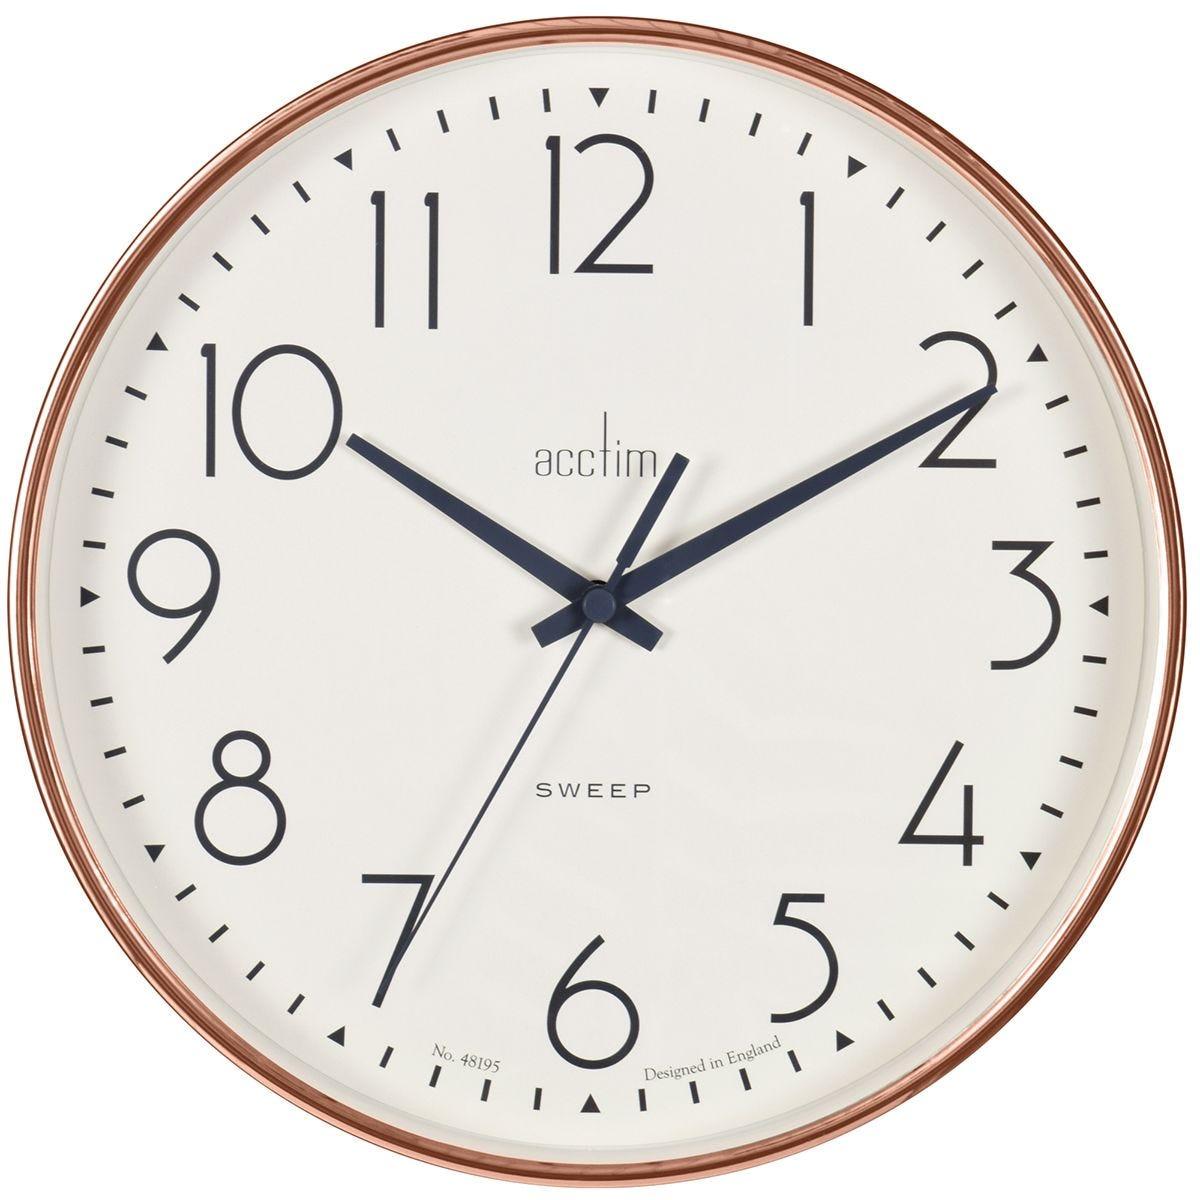 Acctim 'Earl' 25cm Sweep Wall Clock - Copper